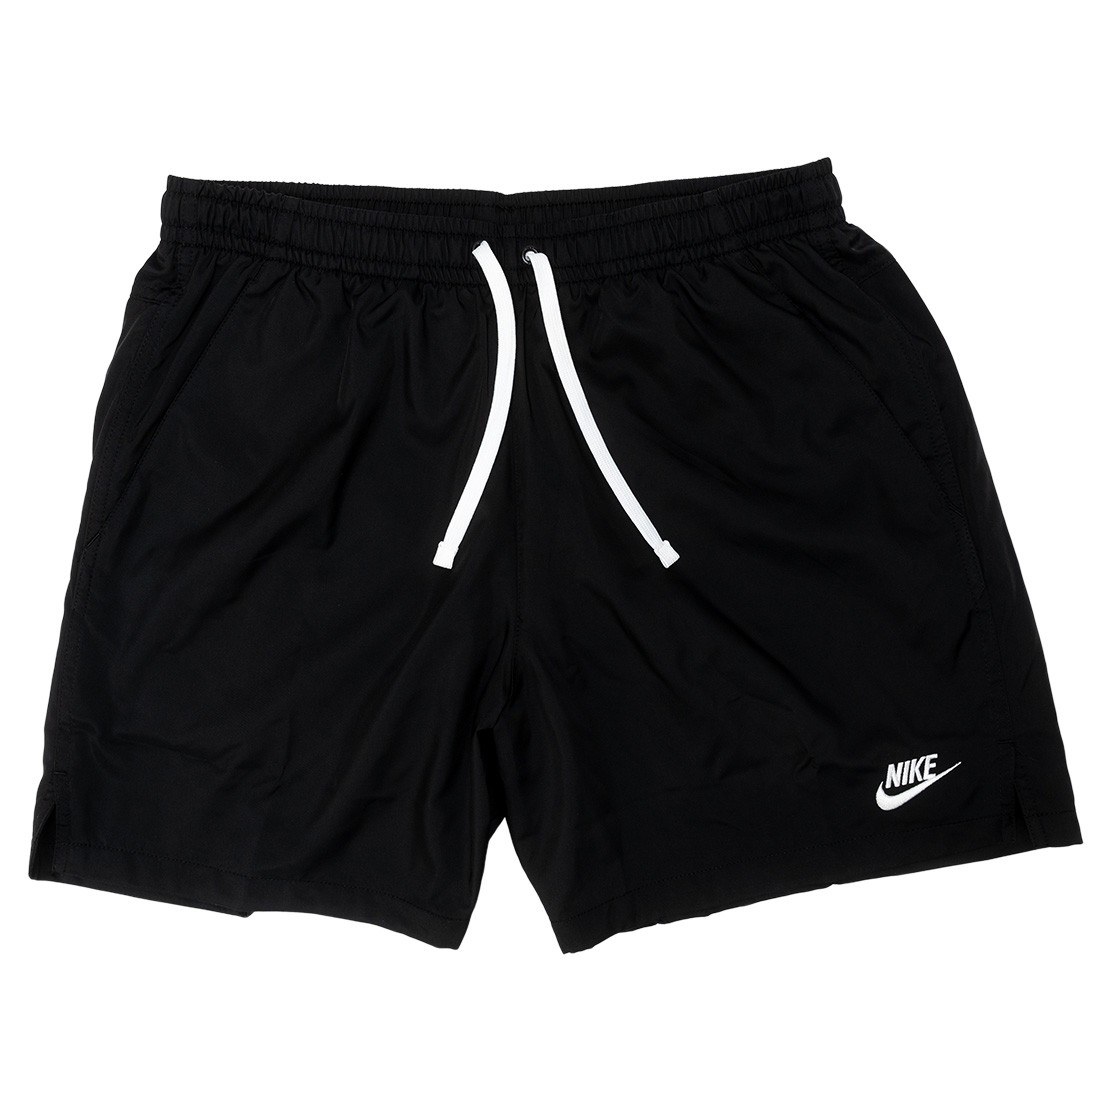 Nike Men Sportswear Shorts (black / white)